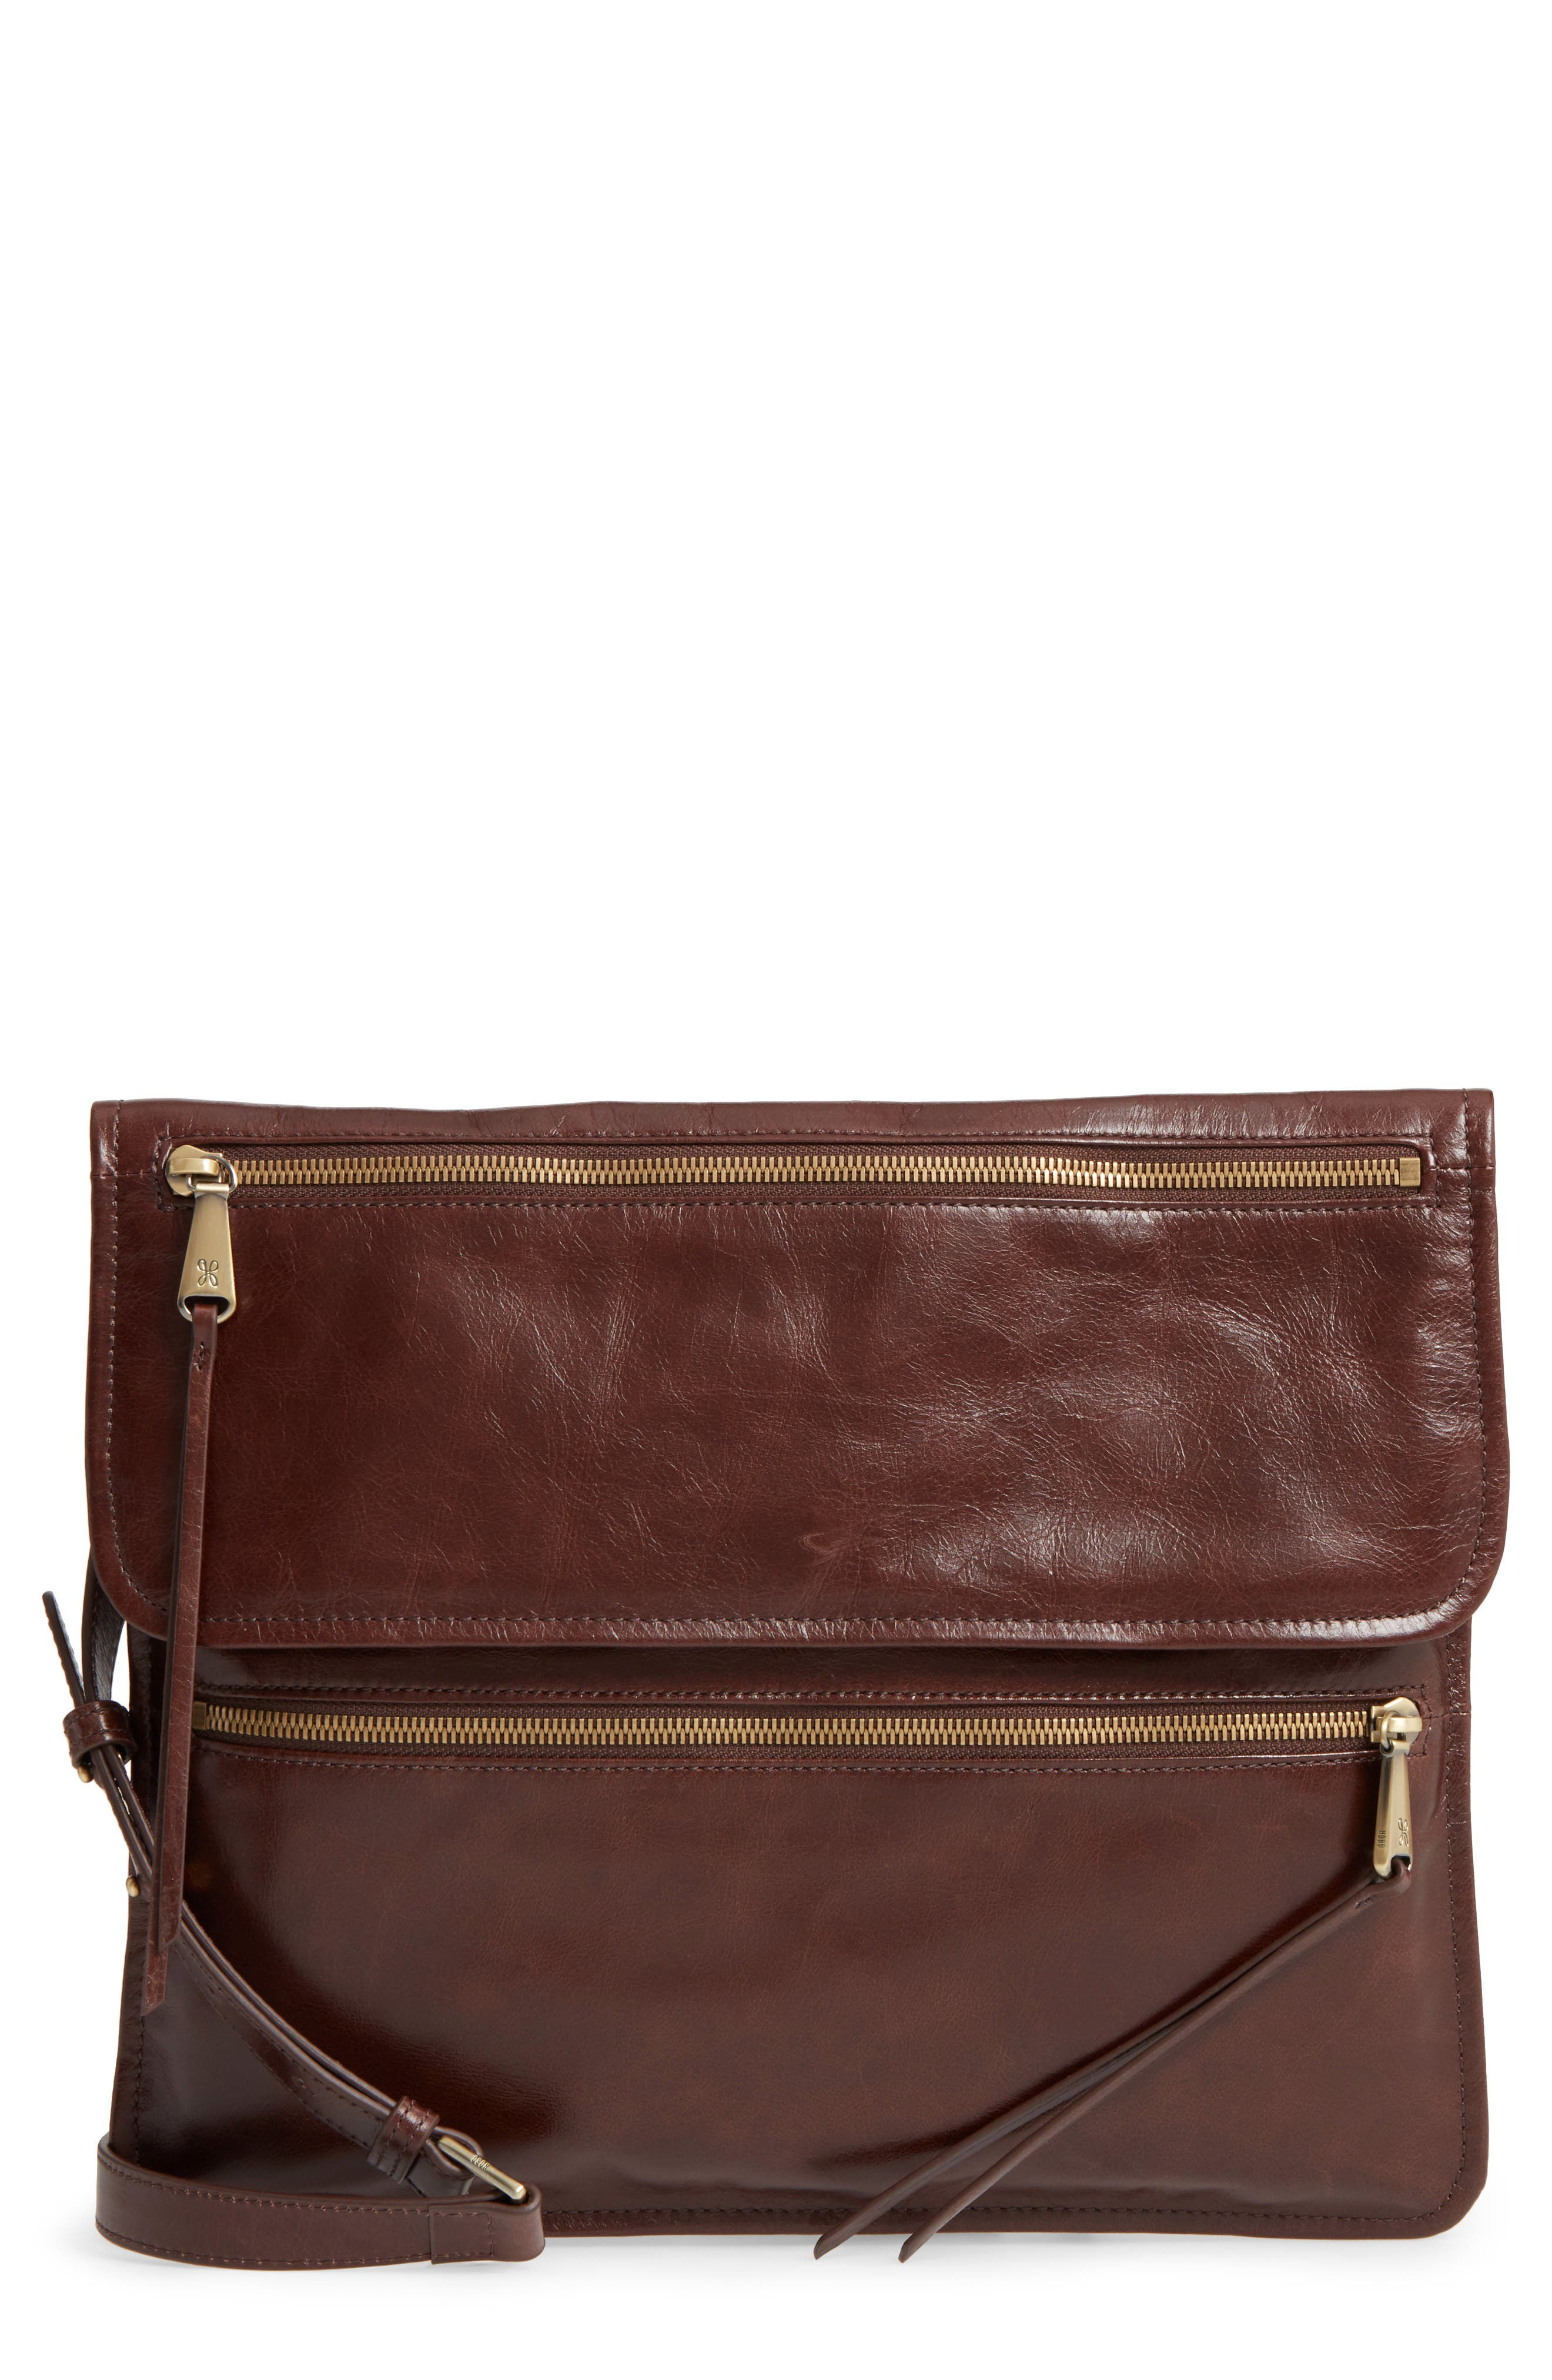 Hobo Vista Calfskin Leather Messenger Bag